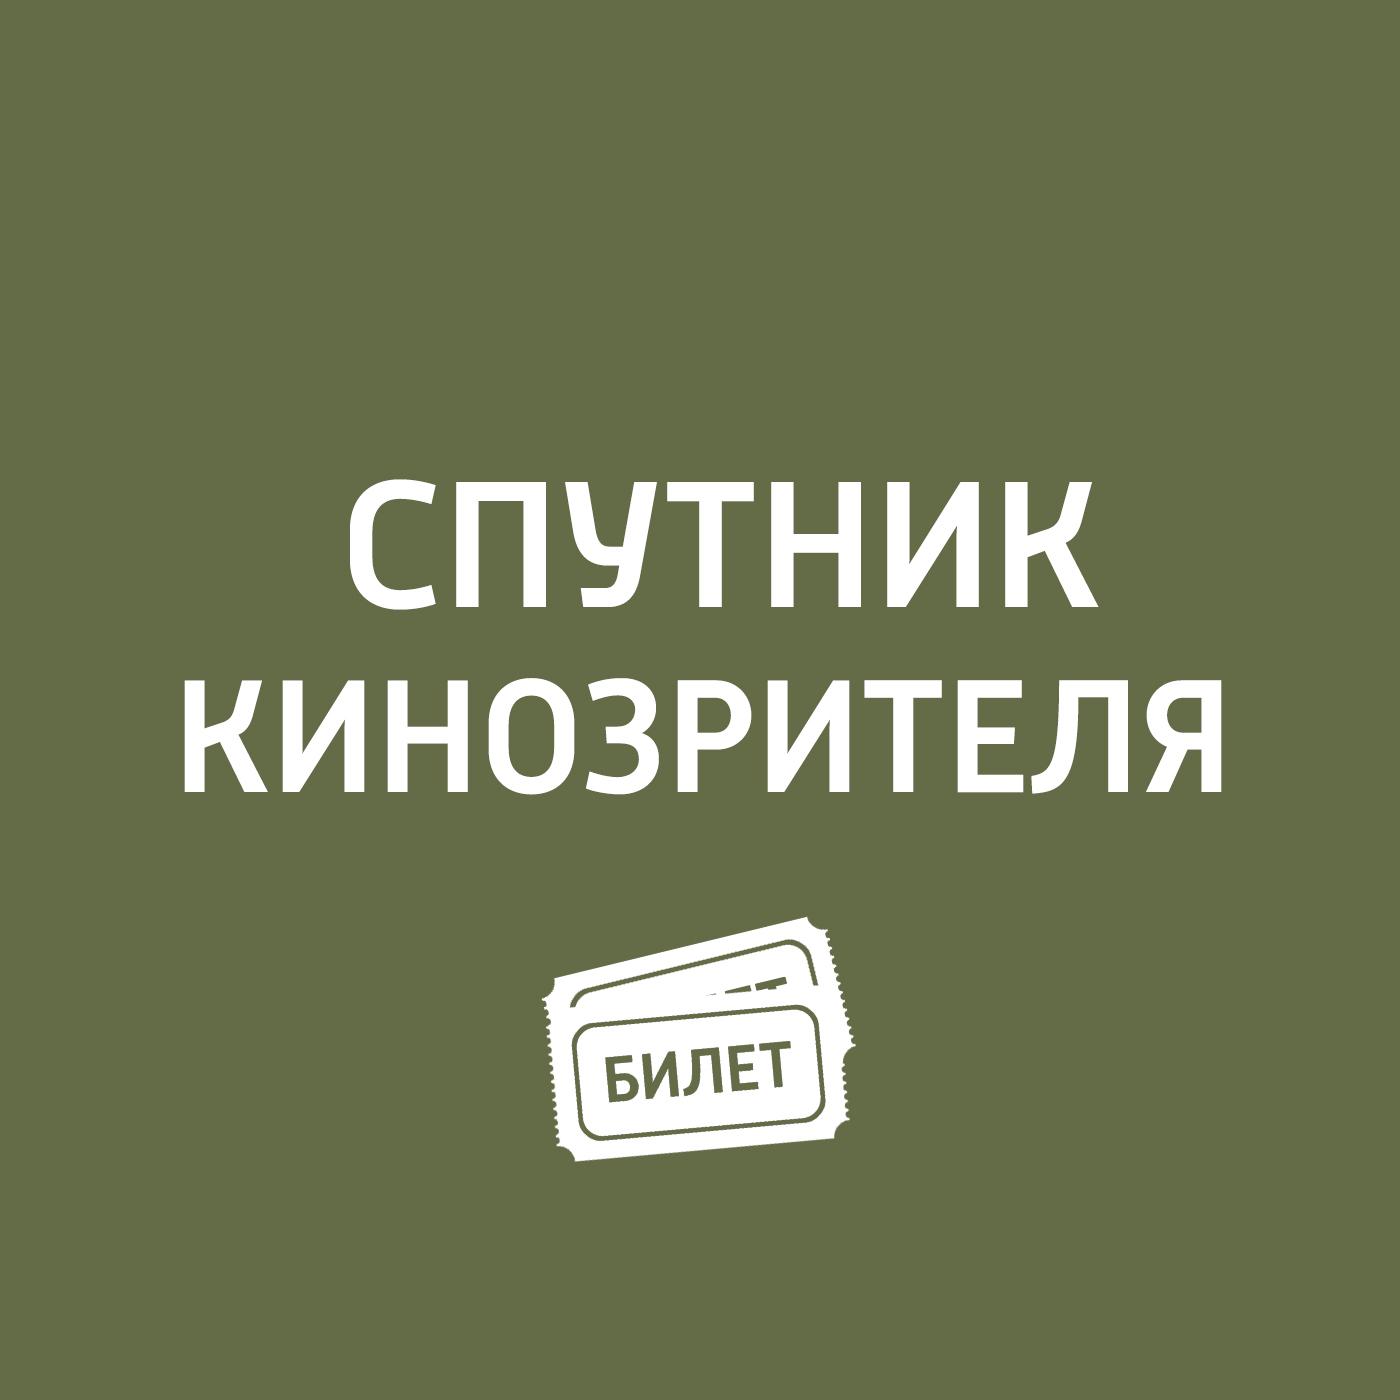 Антон Долин Ушел из жизни известный кинокритик Даниил Дондурей